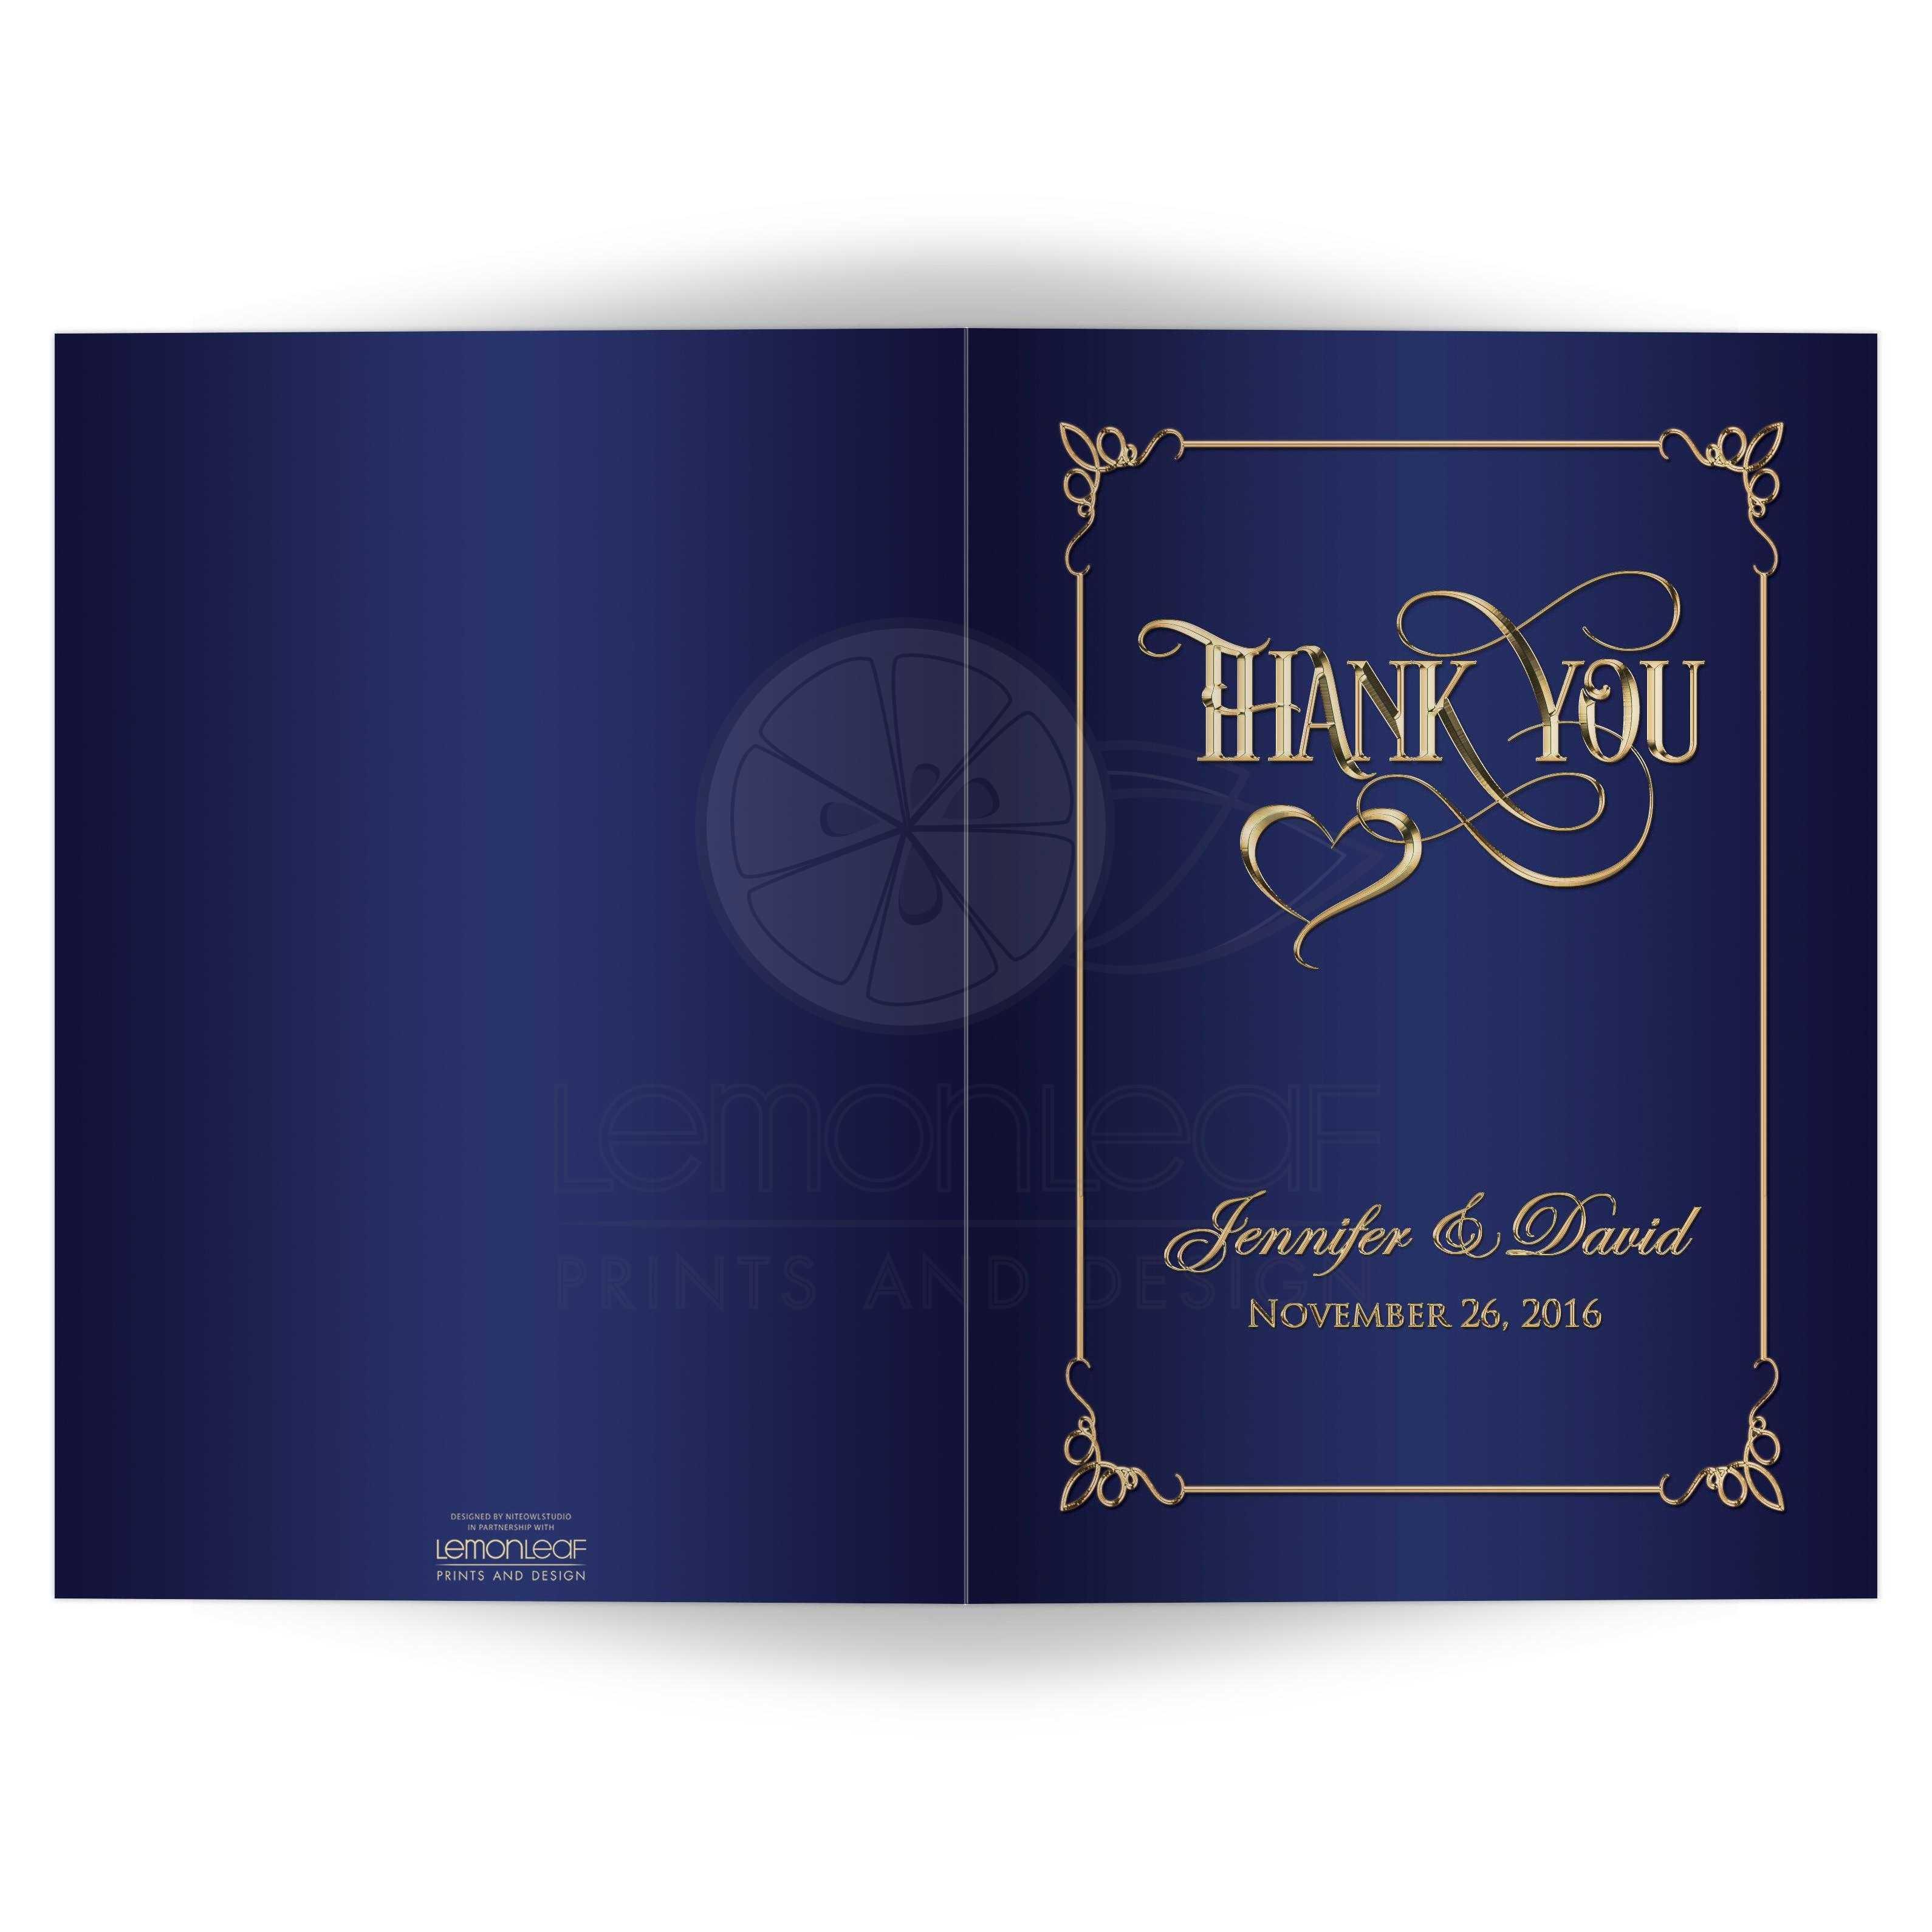 5x7 Photo Thank You Card Navy Blue Gold Ornate Scrolls Heart